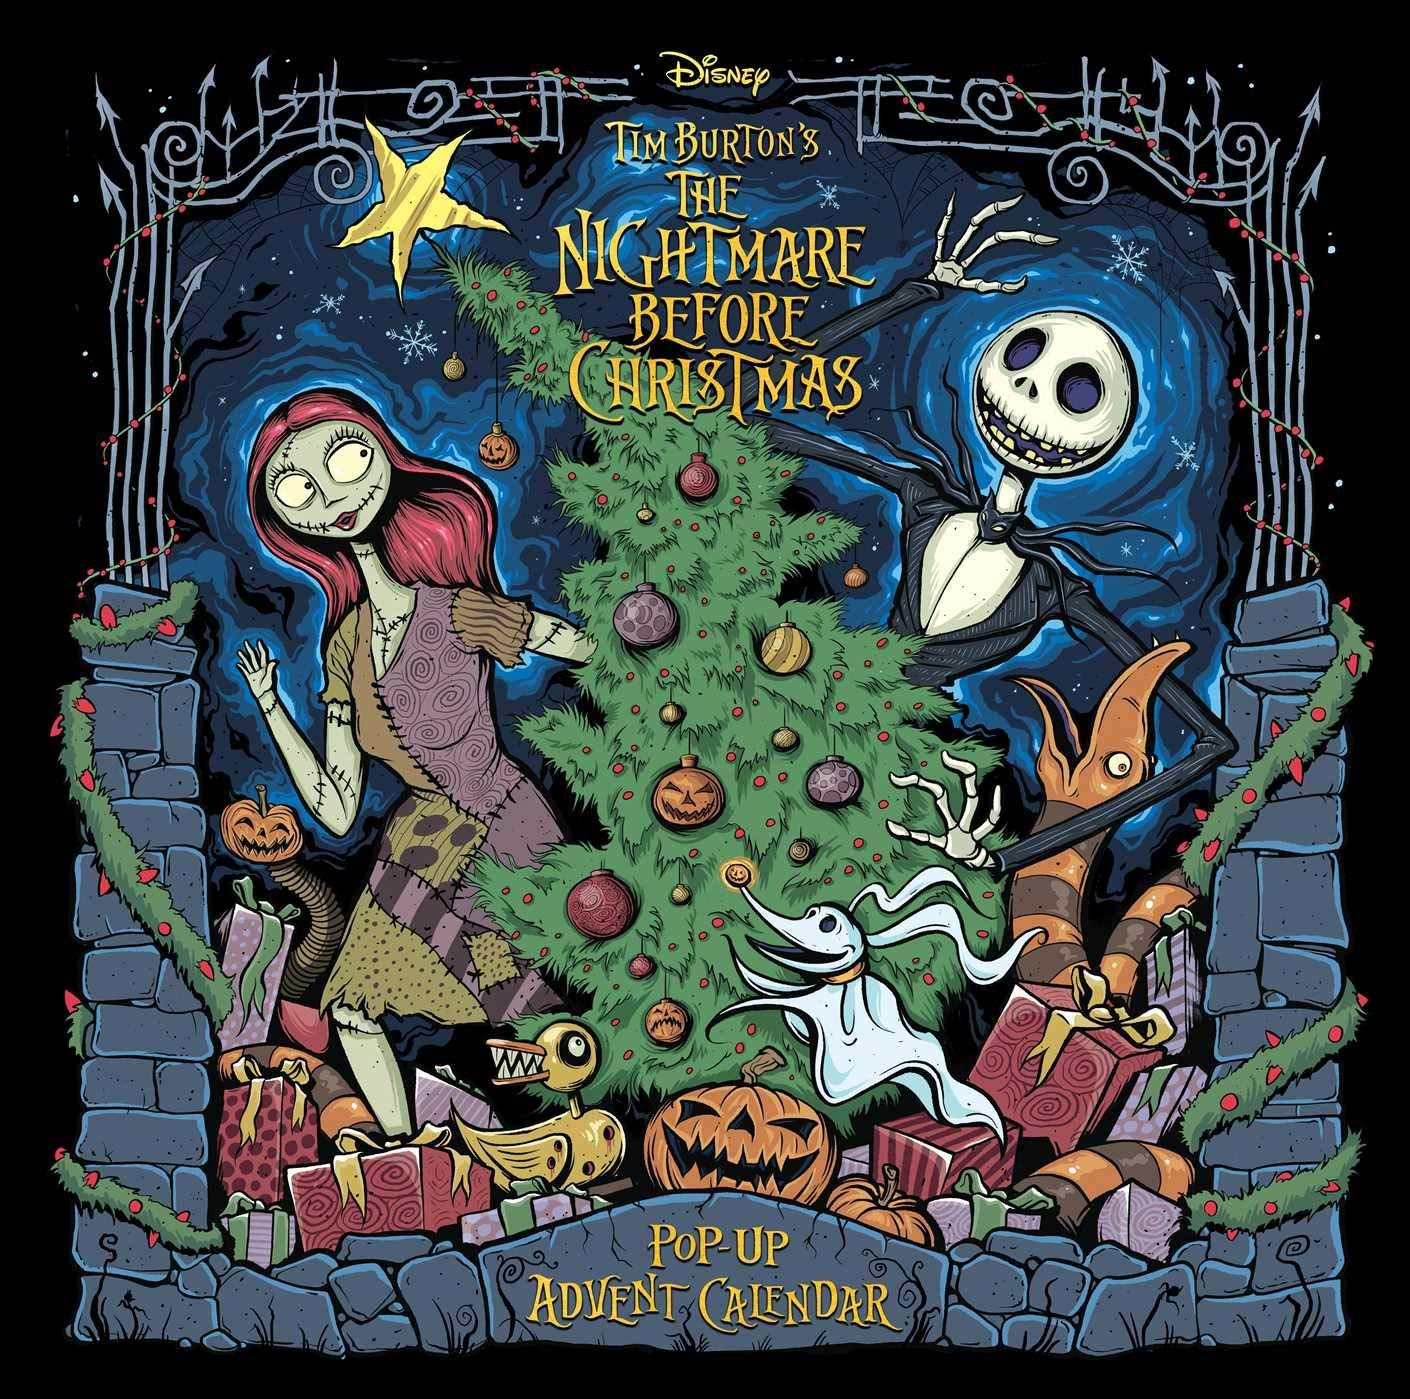 Merry Christmas Funko Pop 2020 Amazon.com: The Nightmare Before Christmas: Advent Calendar and